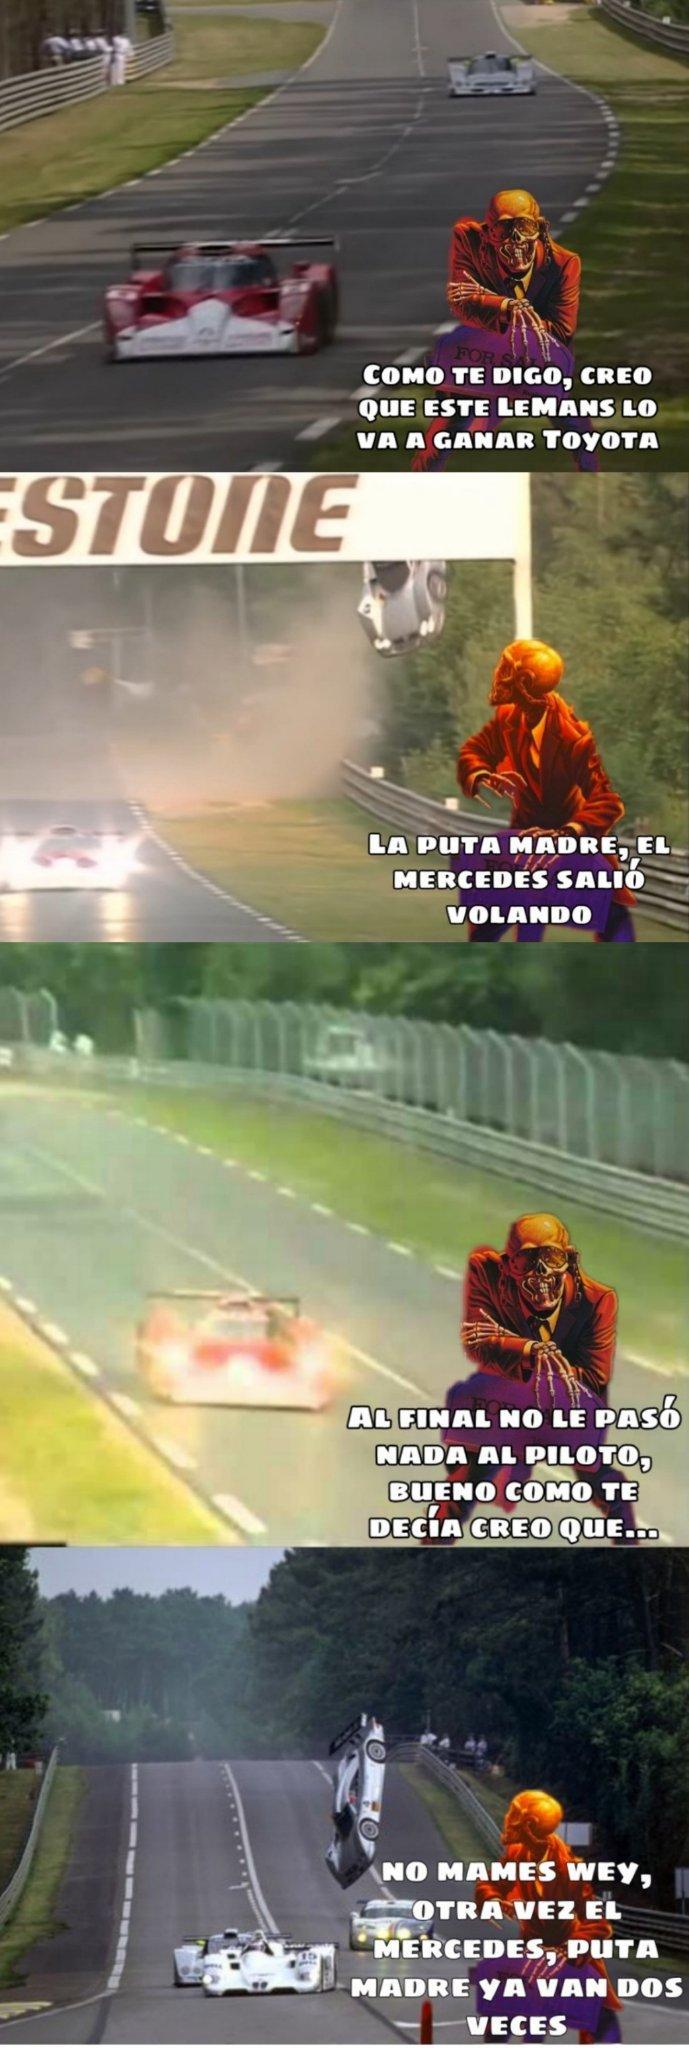 Aeropuerto internacional de Le Mans, Mercedes Benz Airlines - meme